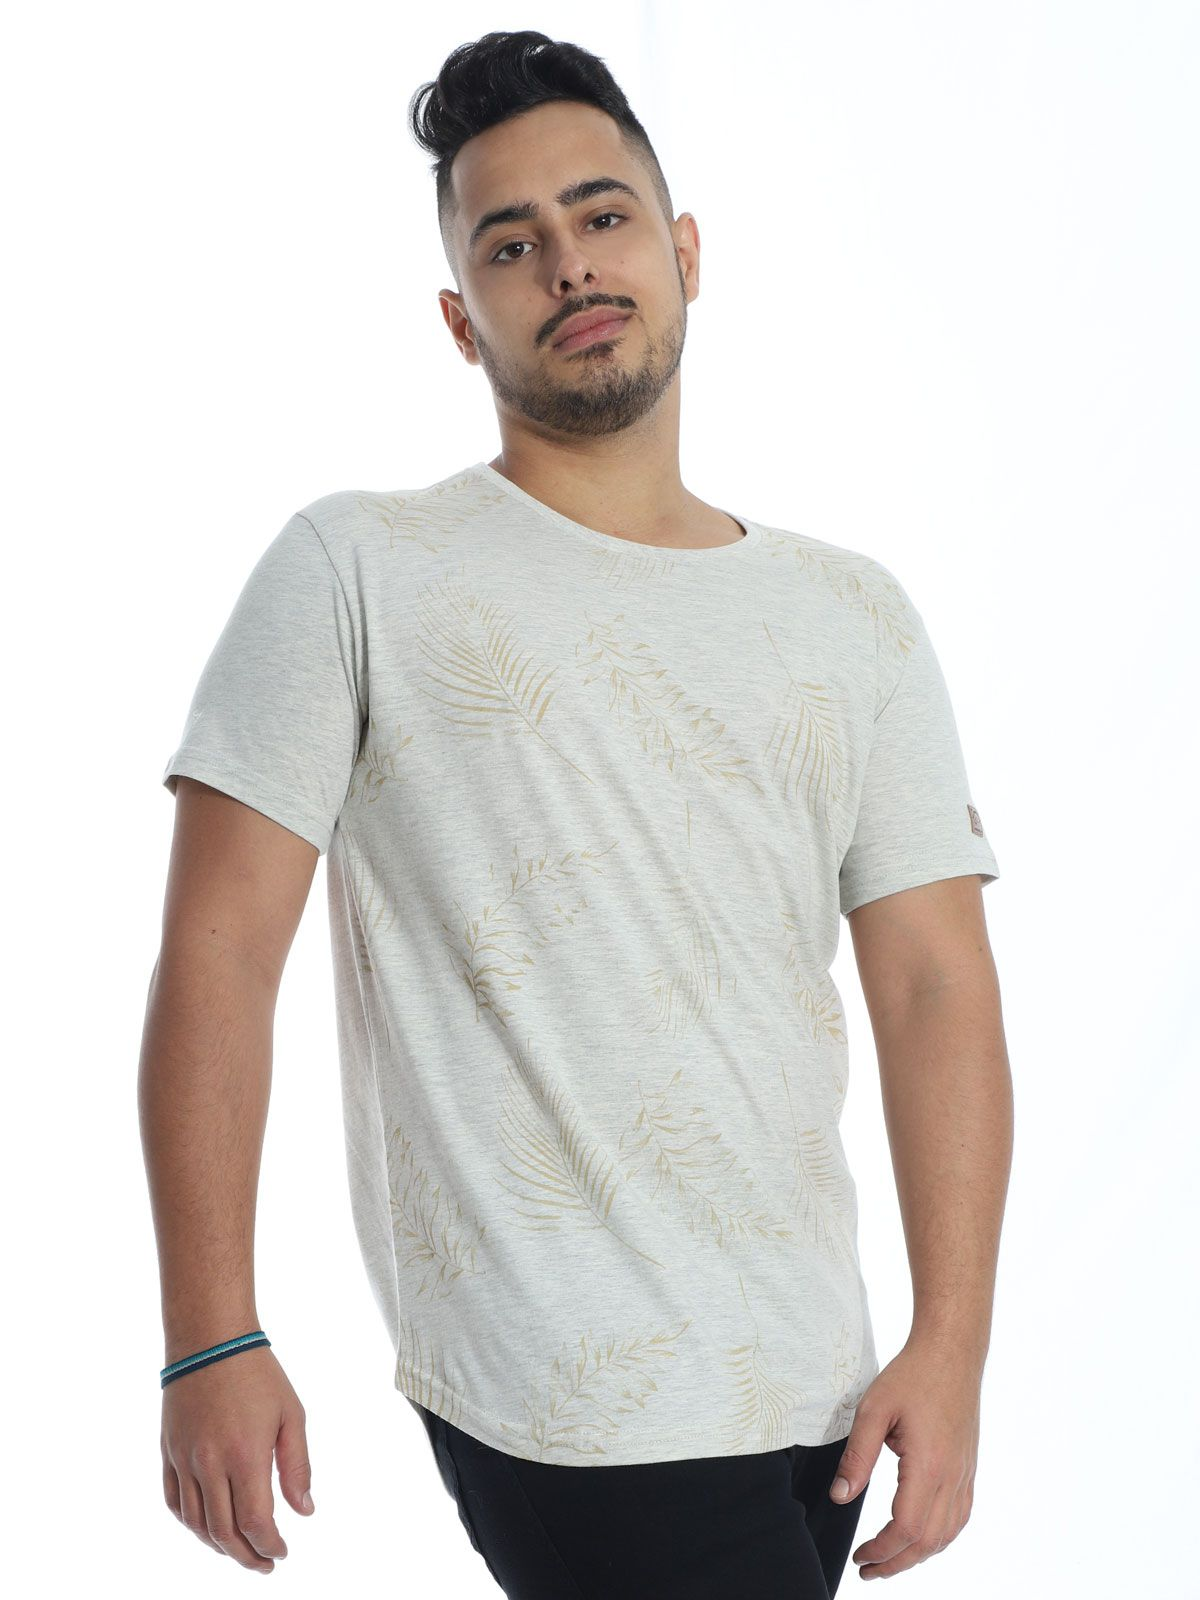 Camiseta Masculina Longline Swag Anistia Leafs Mescla Cru